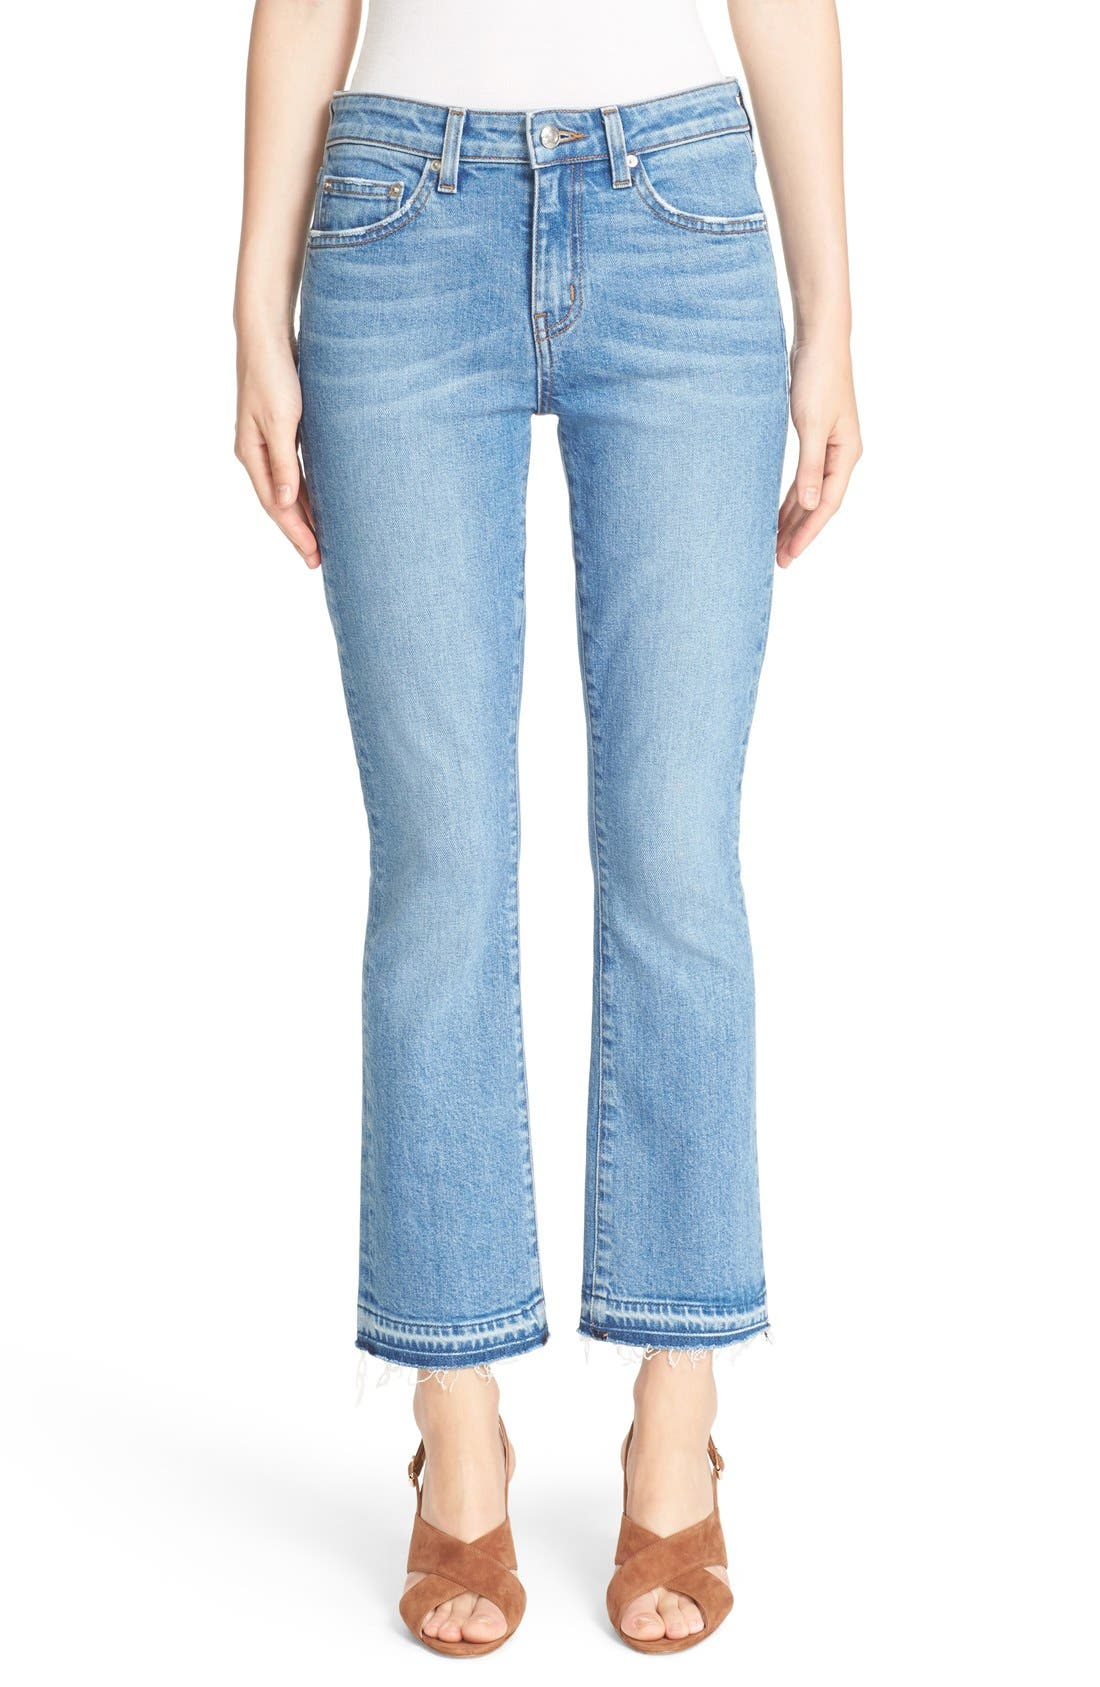 Main Image - Derek Lam 10 Crosby 'Gia' Crop Flare Jeans (Light Wash)